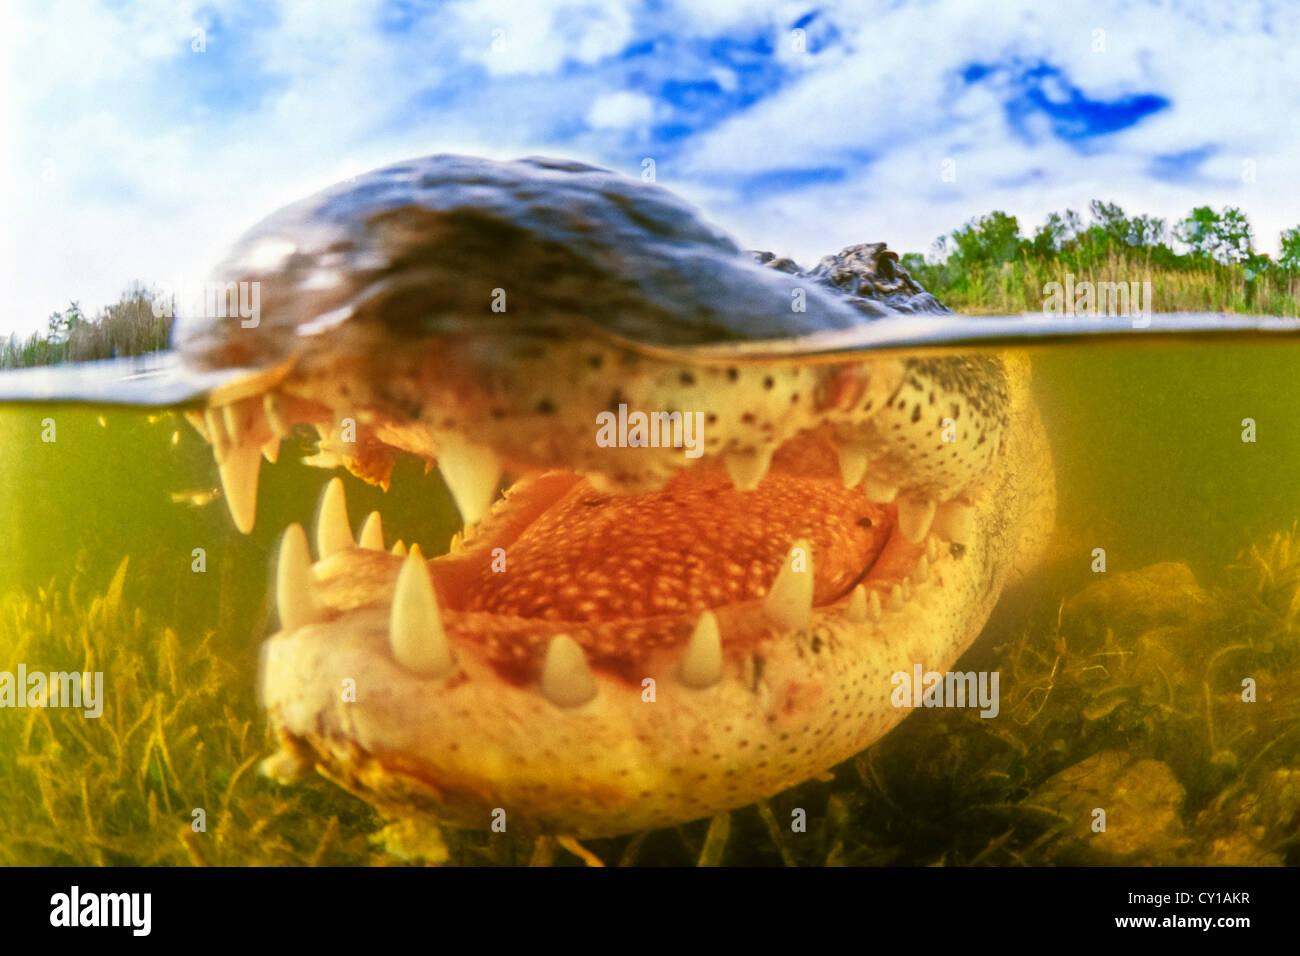 Alligator mississippiensis, Alligator, le Parc National des Everglades, Florida, USA Photo Stock